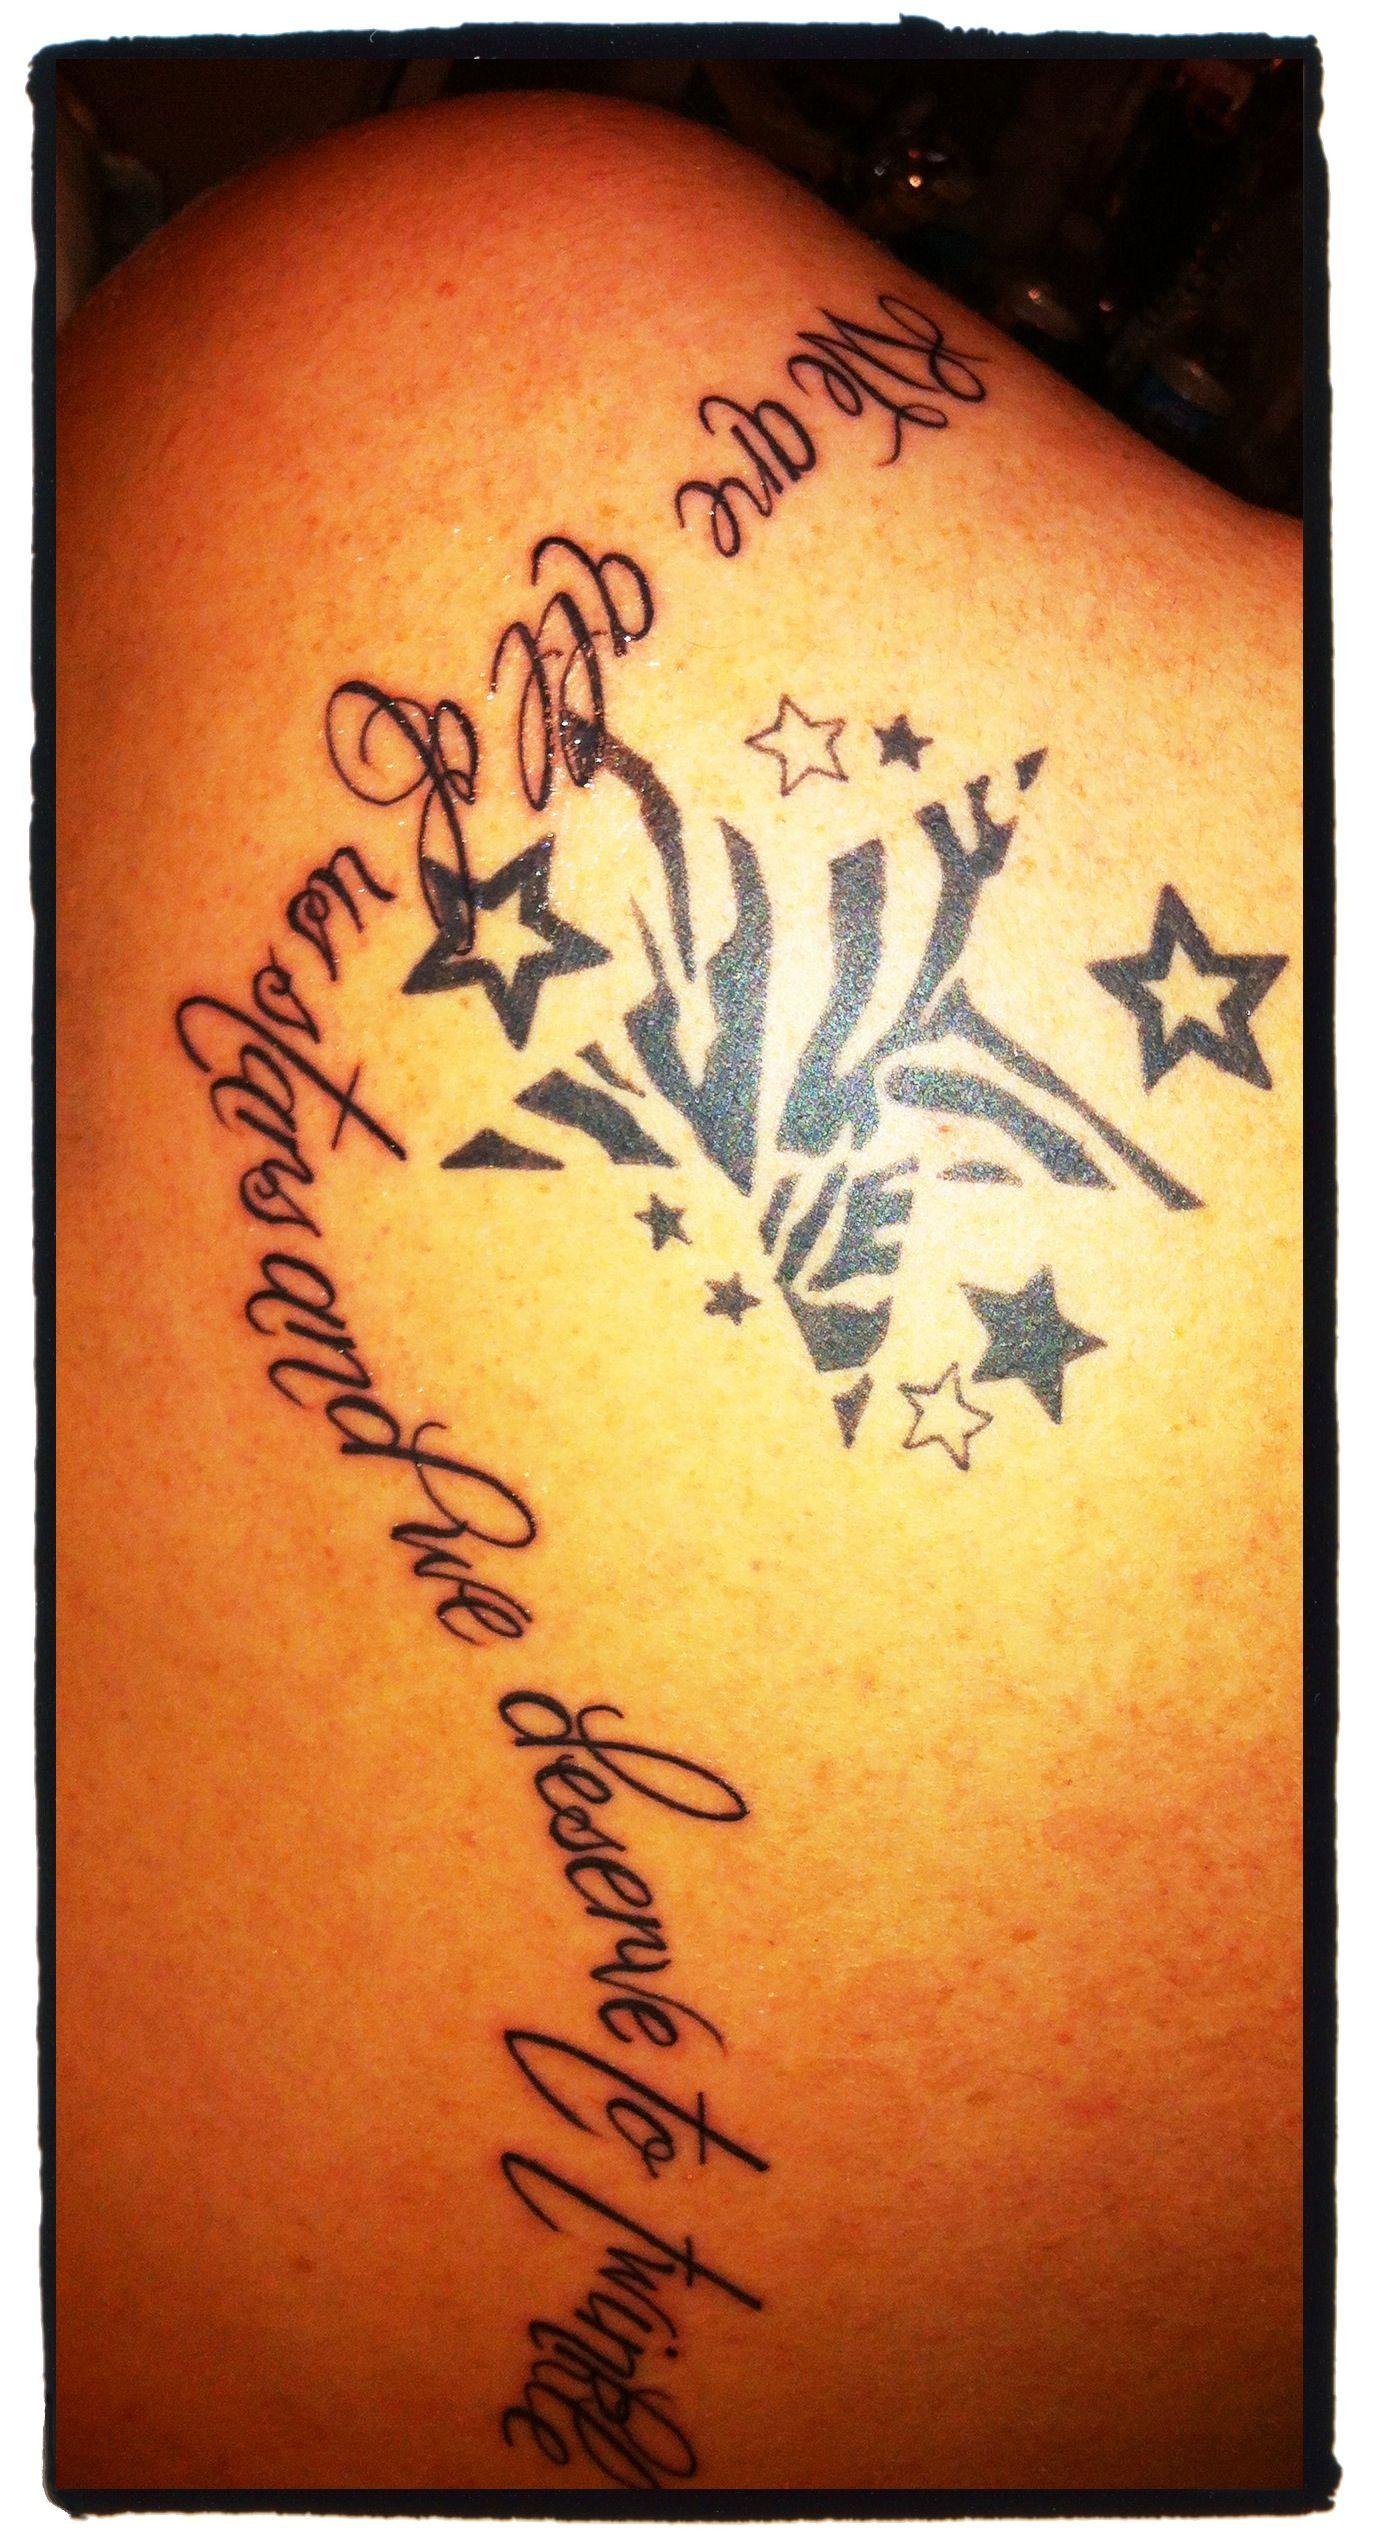 Marilyn Monroe quote tattoo   MARILYN MONROE   Tattoos, Star ...